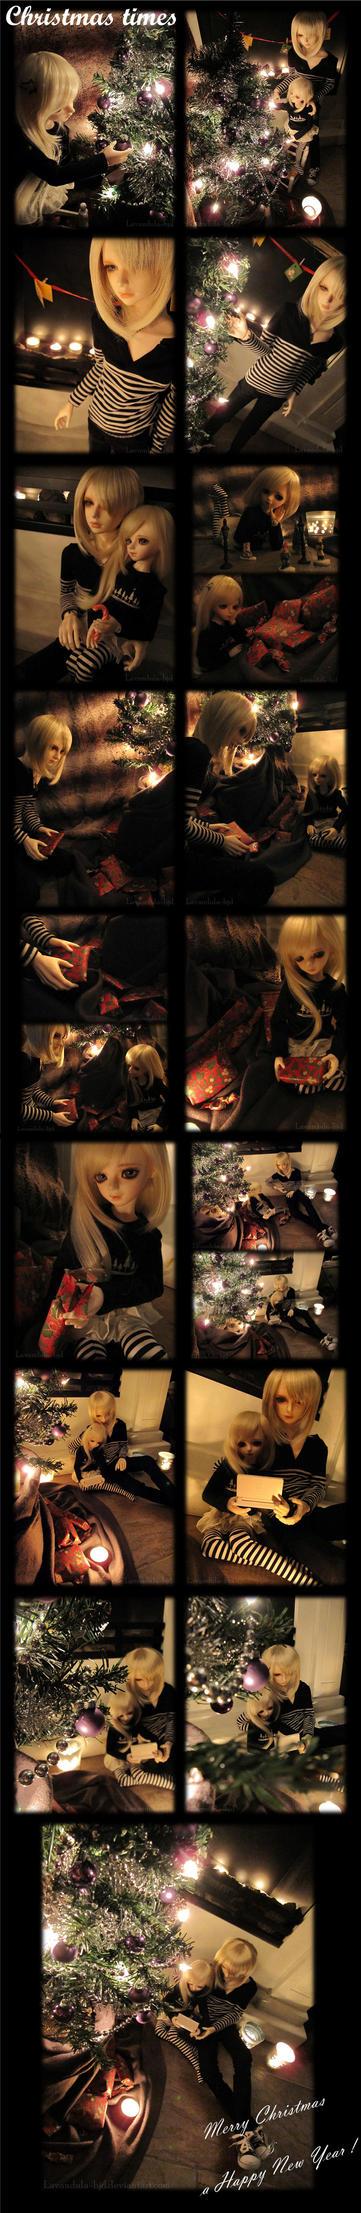 Christmas Times by Lavandula-BJD